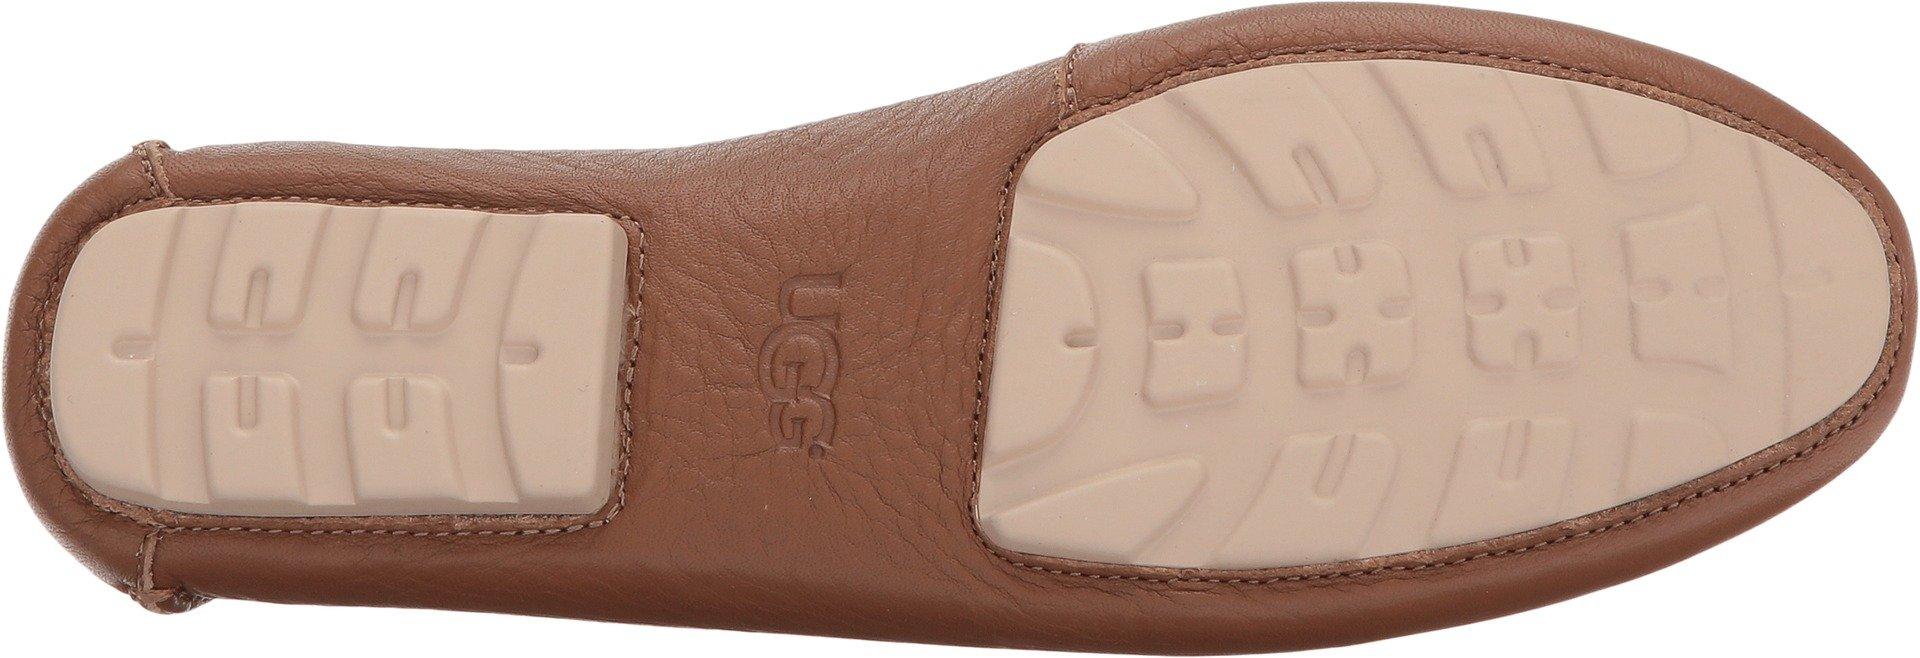 UGG Women's Royce Winter Boot, Chestnut, 5 M US